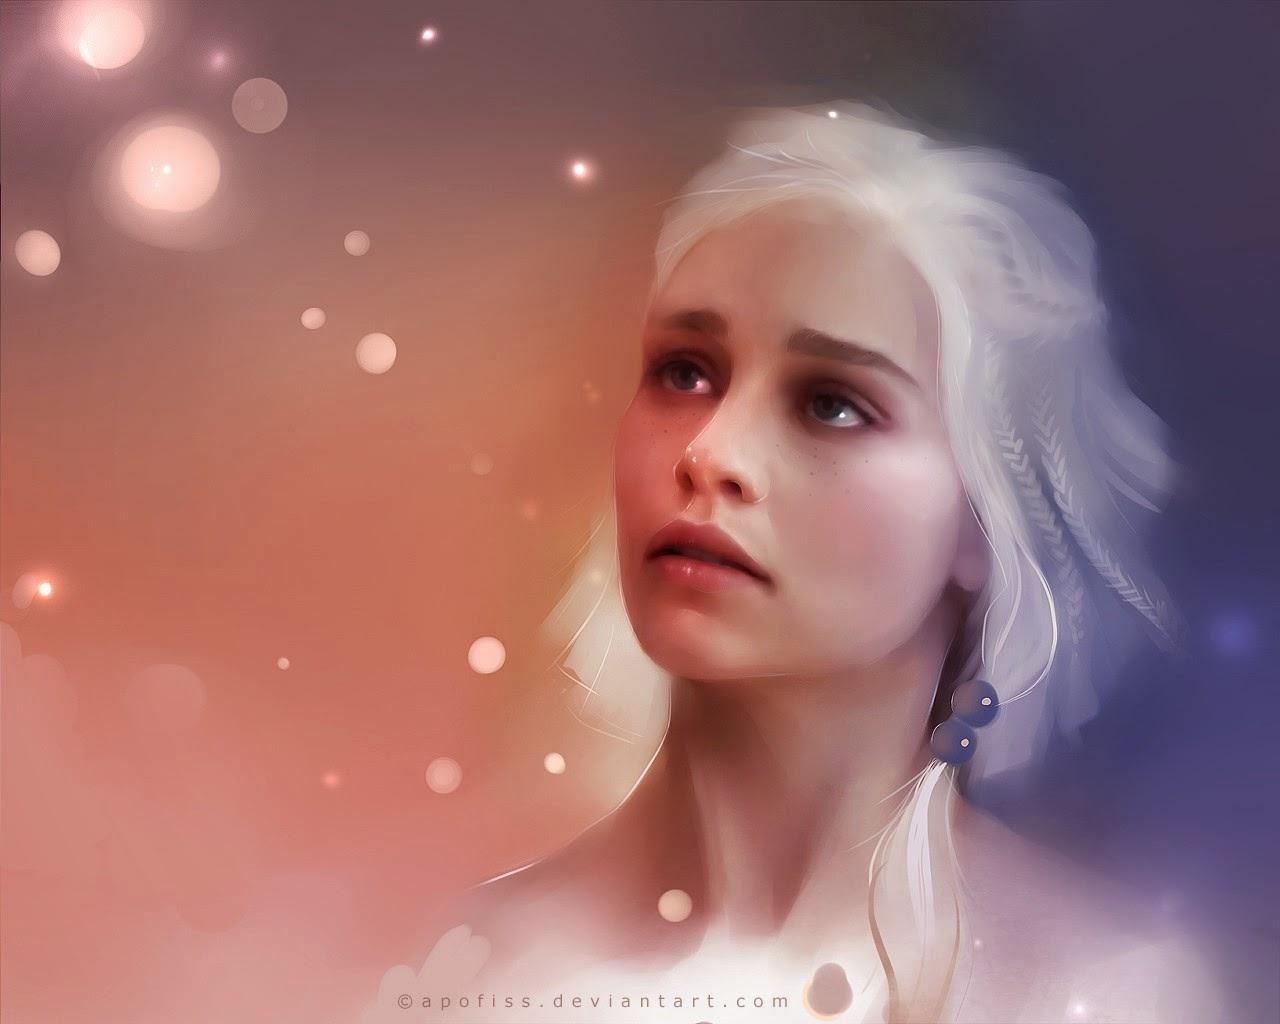 Emilia clarke digital free wallpaper actress photo